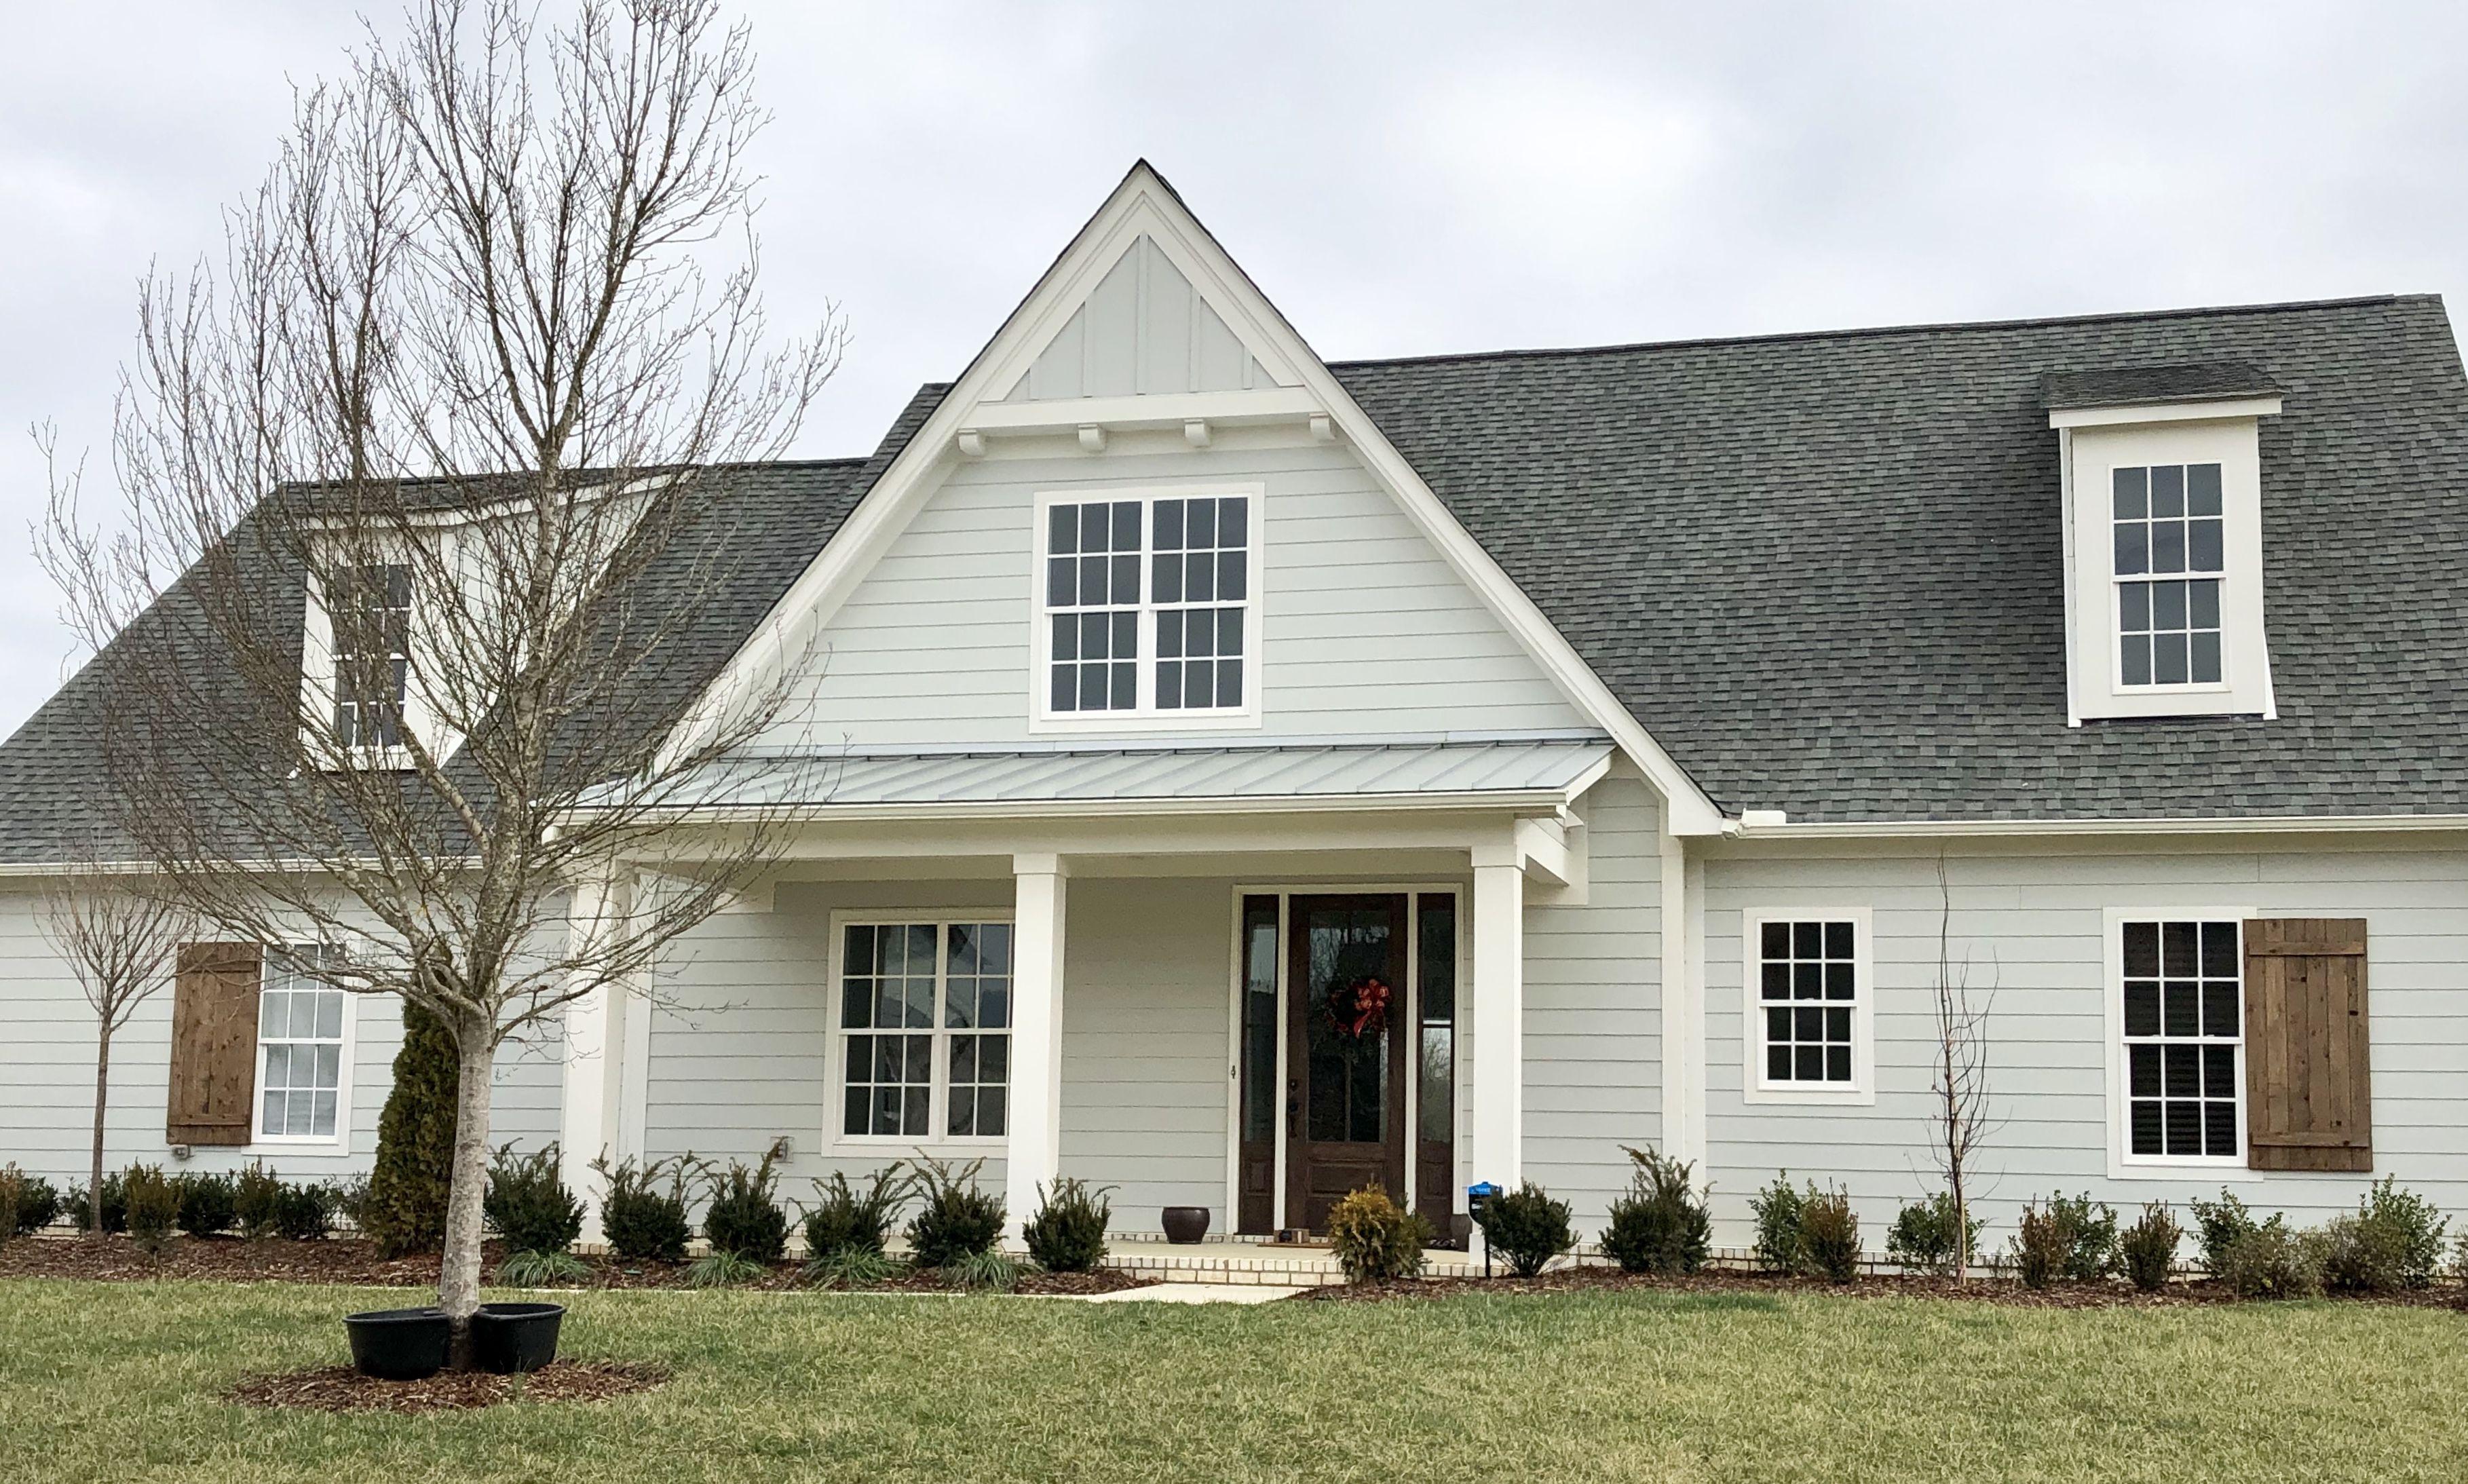 Silverpointe Siding House Exterior White Windows Exterior House Colors